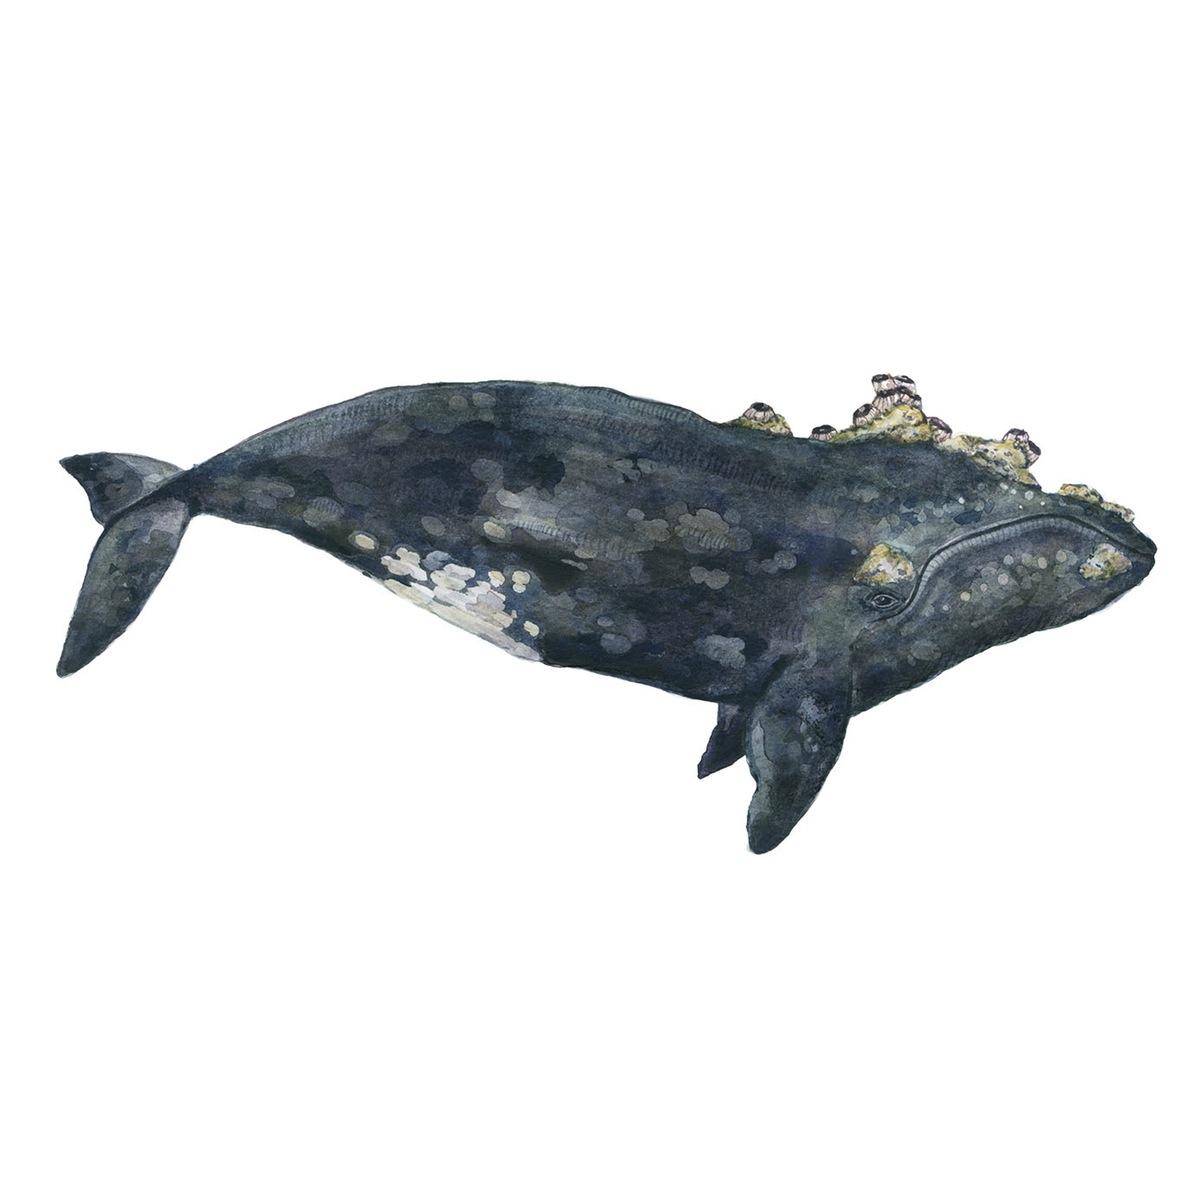 The Balanidae Whale